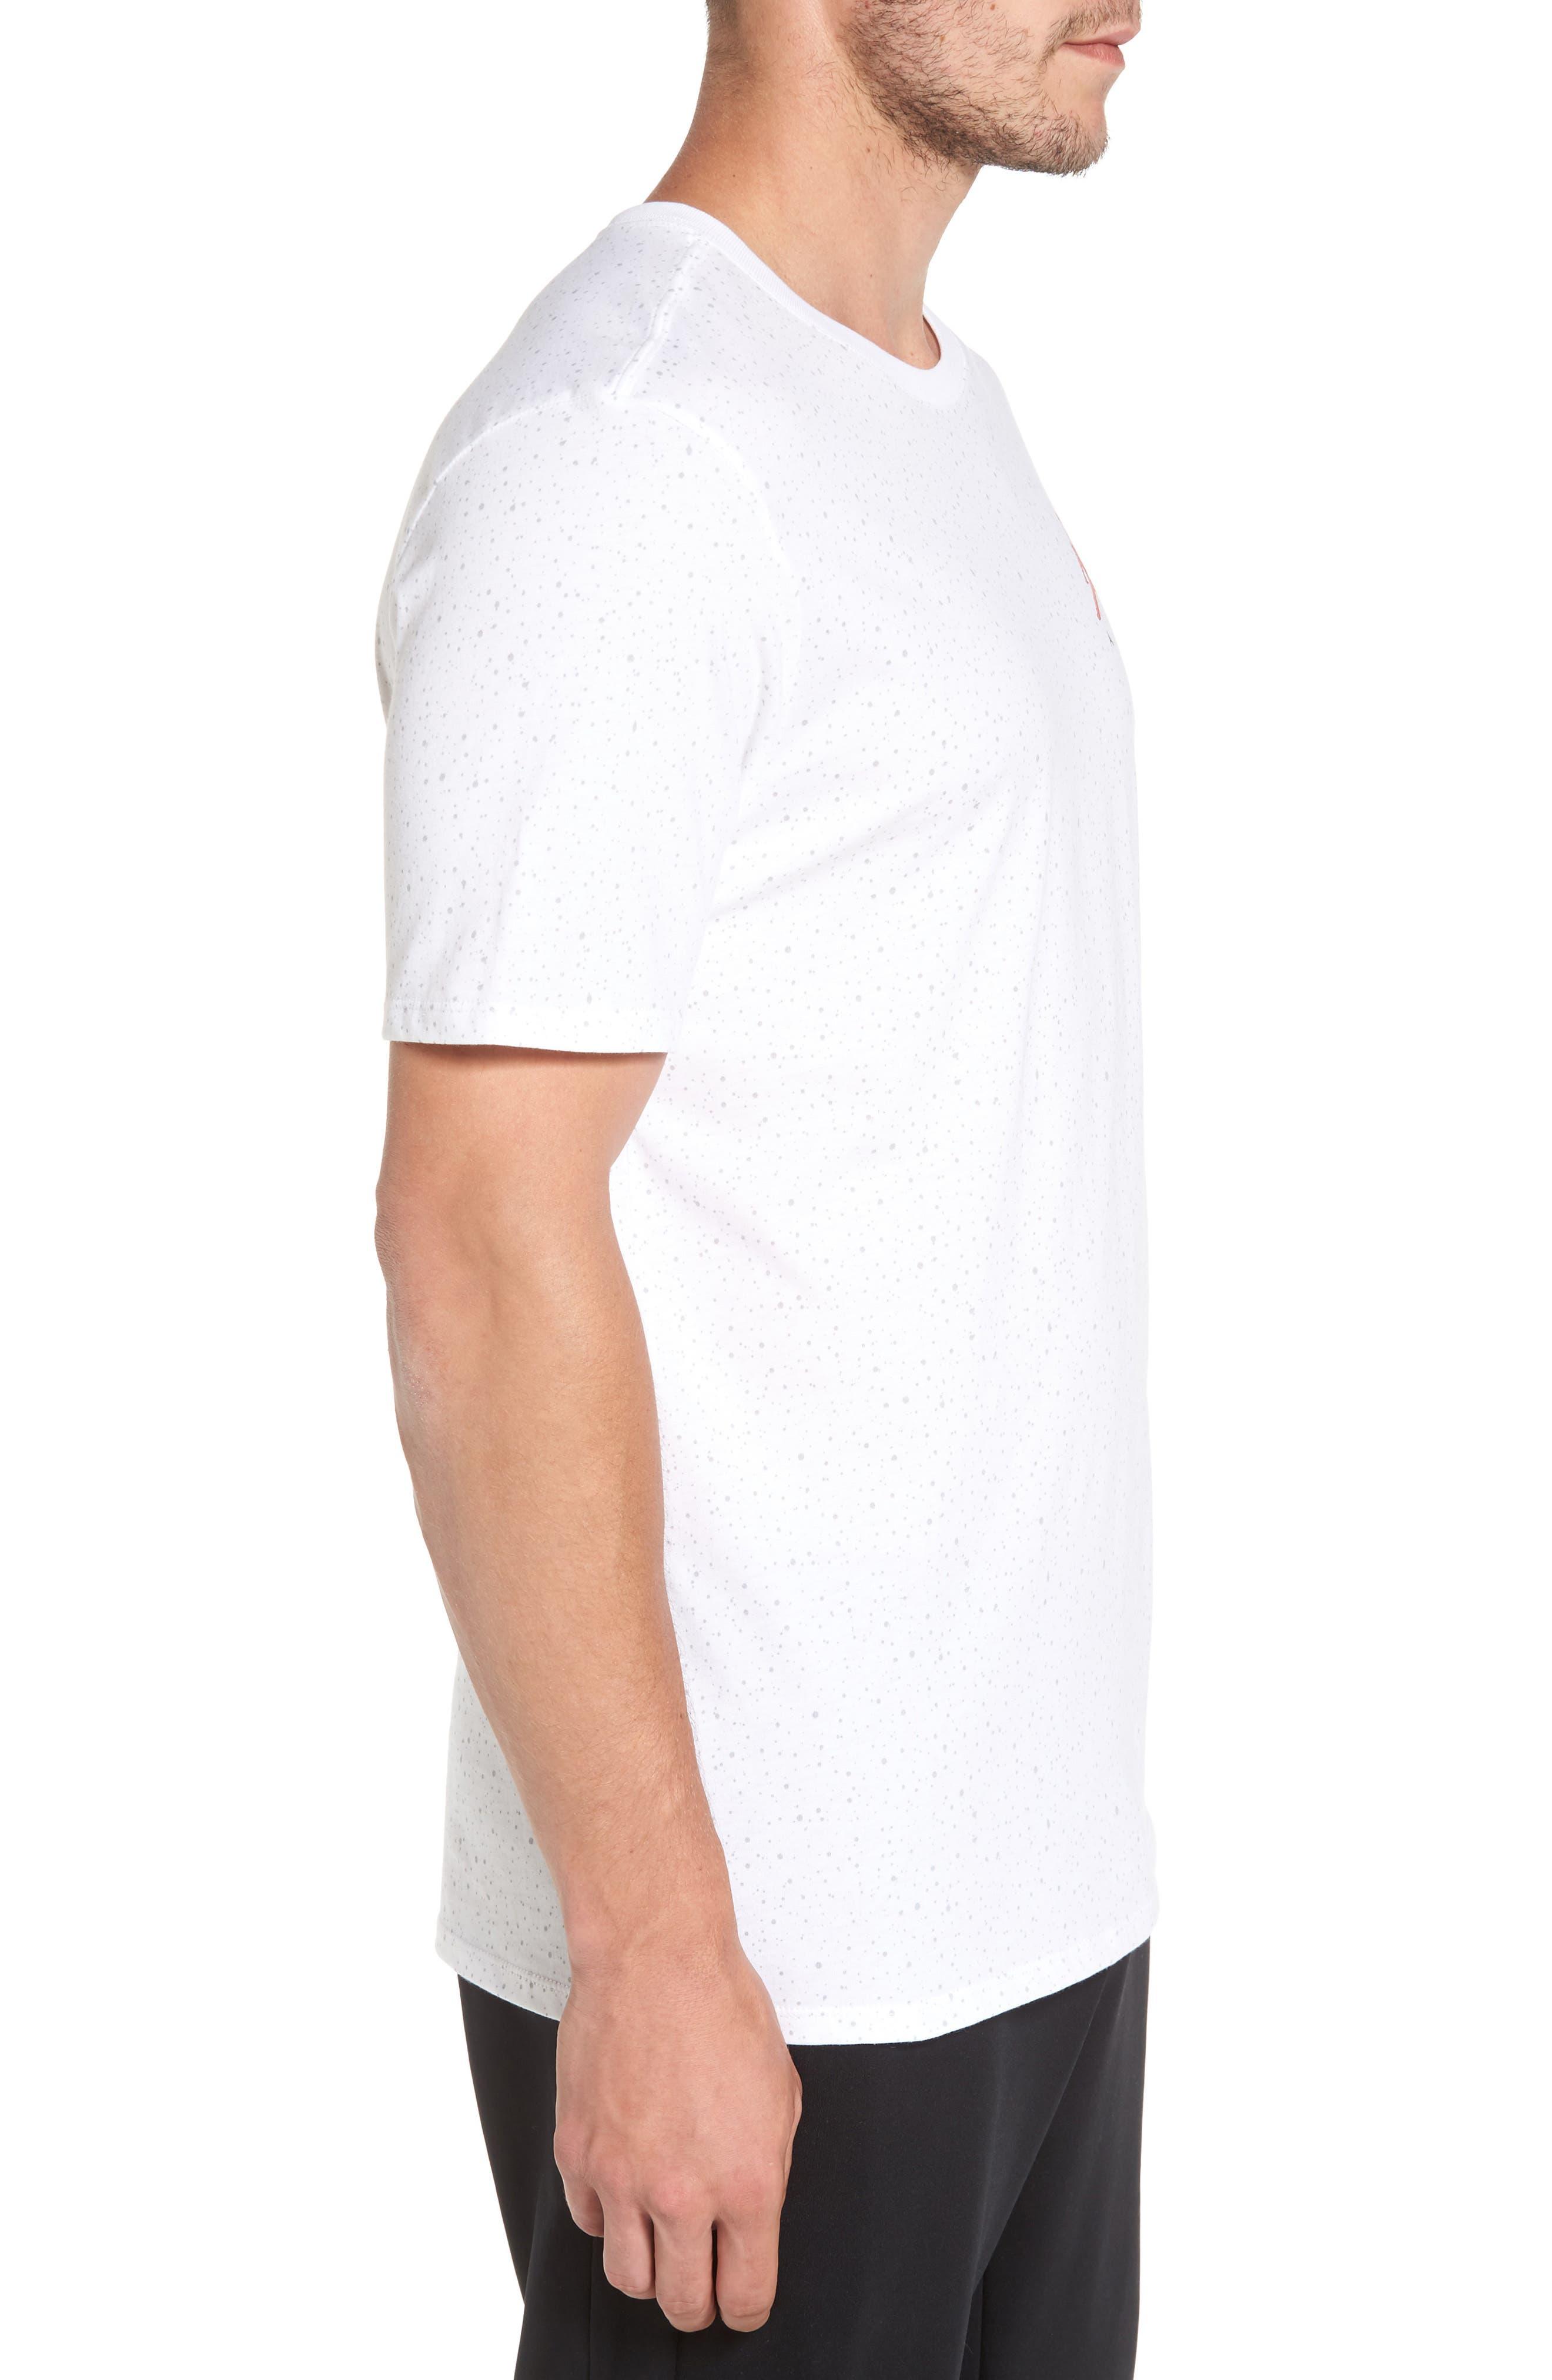 Sportswear Speckle T-Shirt,                             Alternate thumbnail 3, color,                             White/ University Red